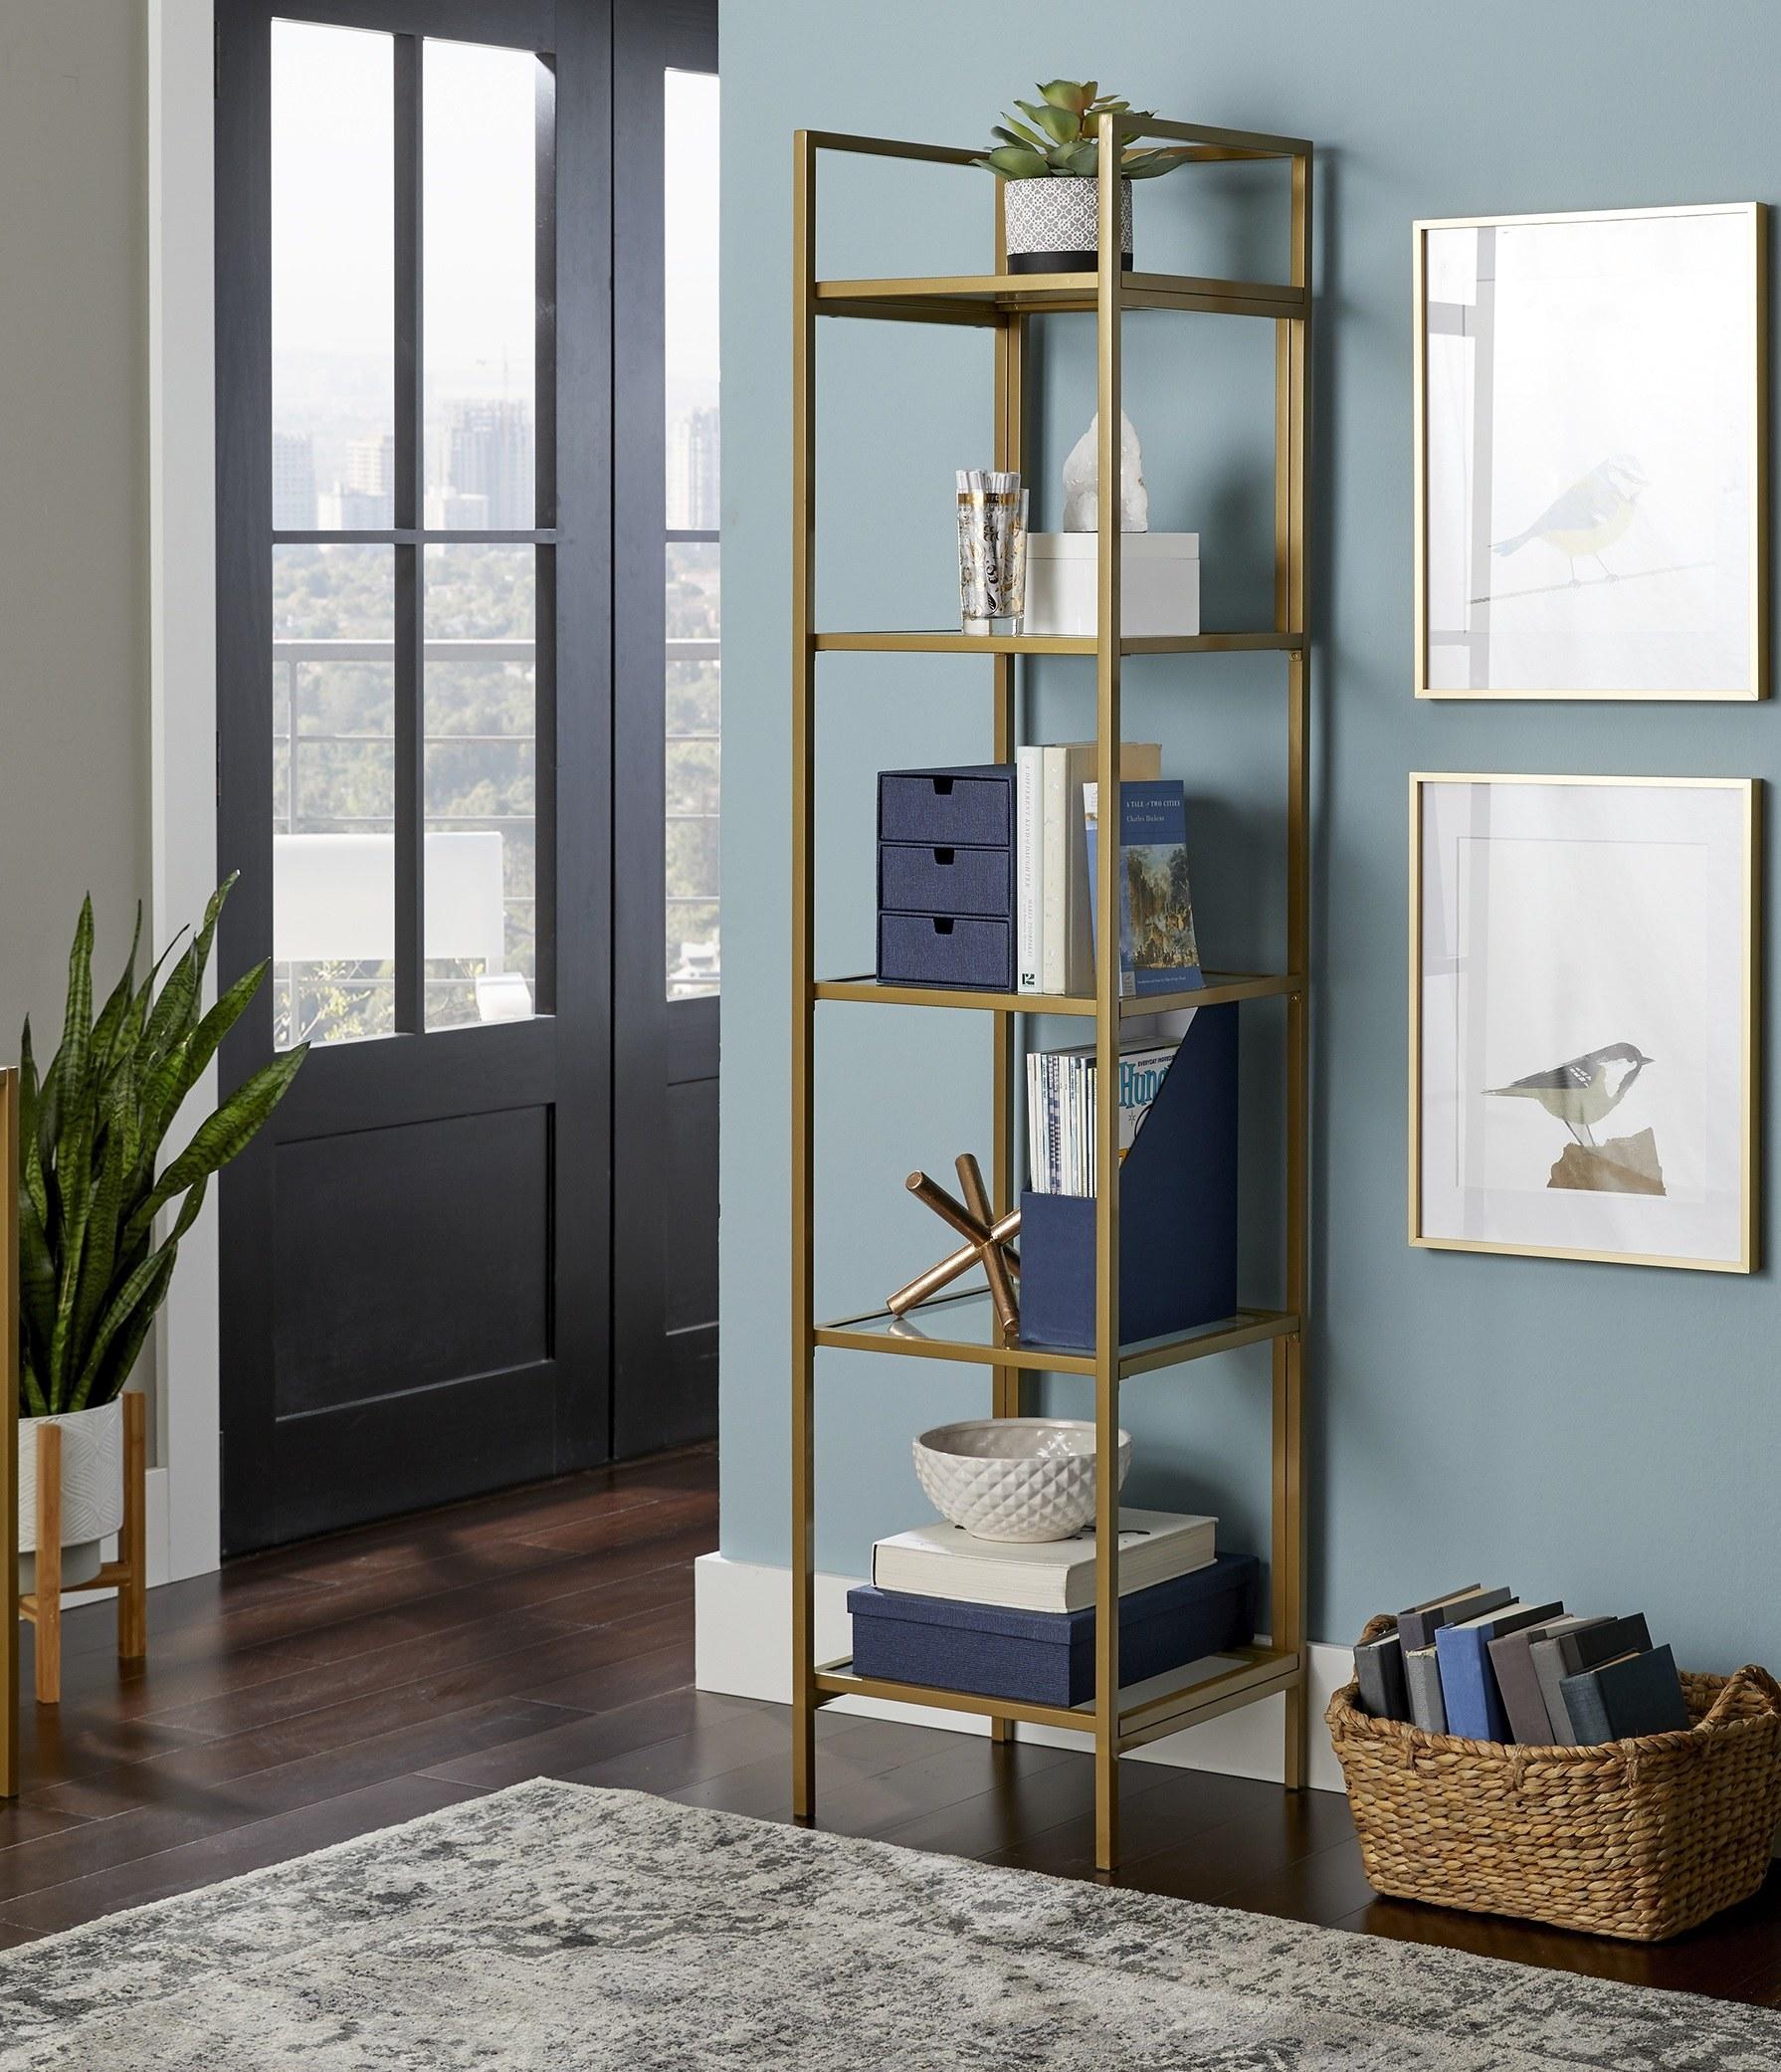 The narrow five-shelf bookcase